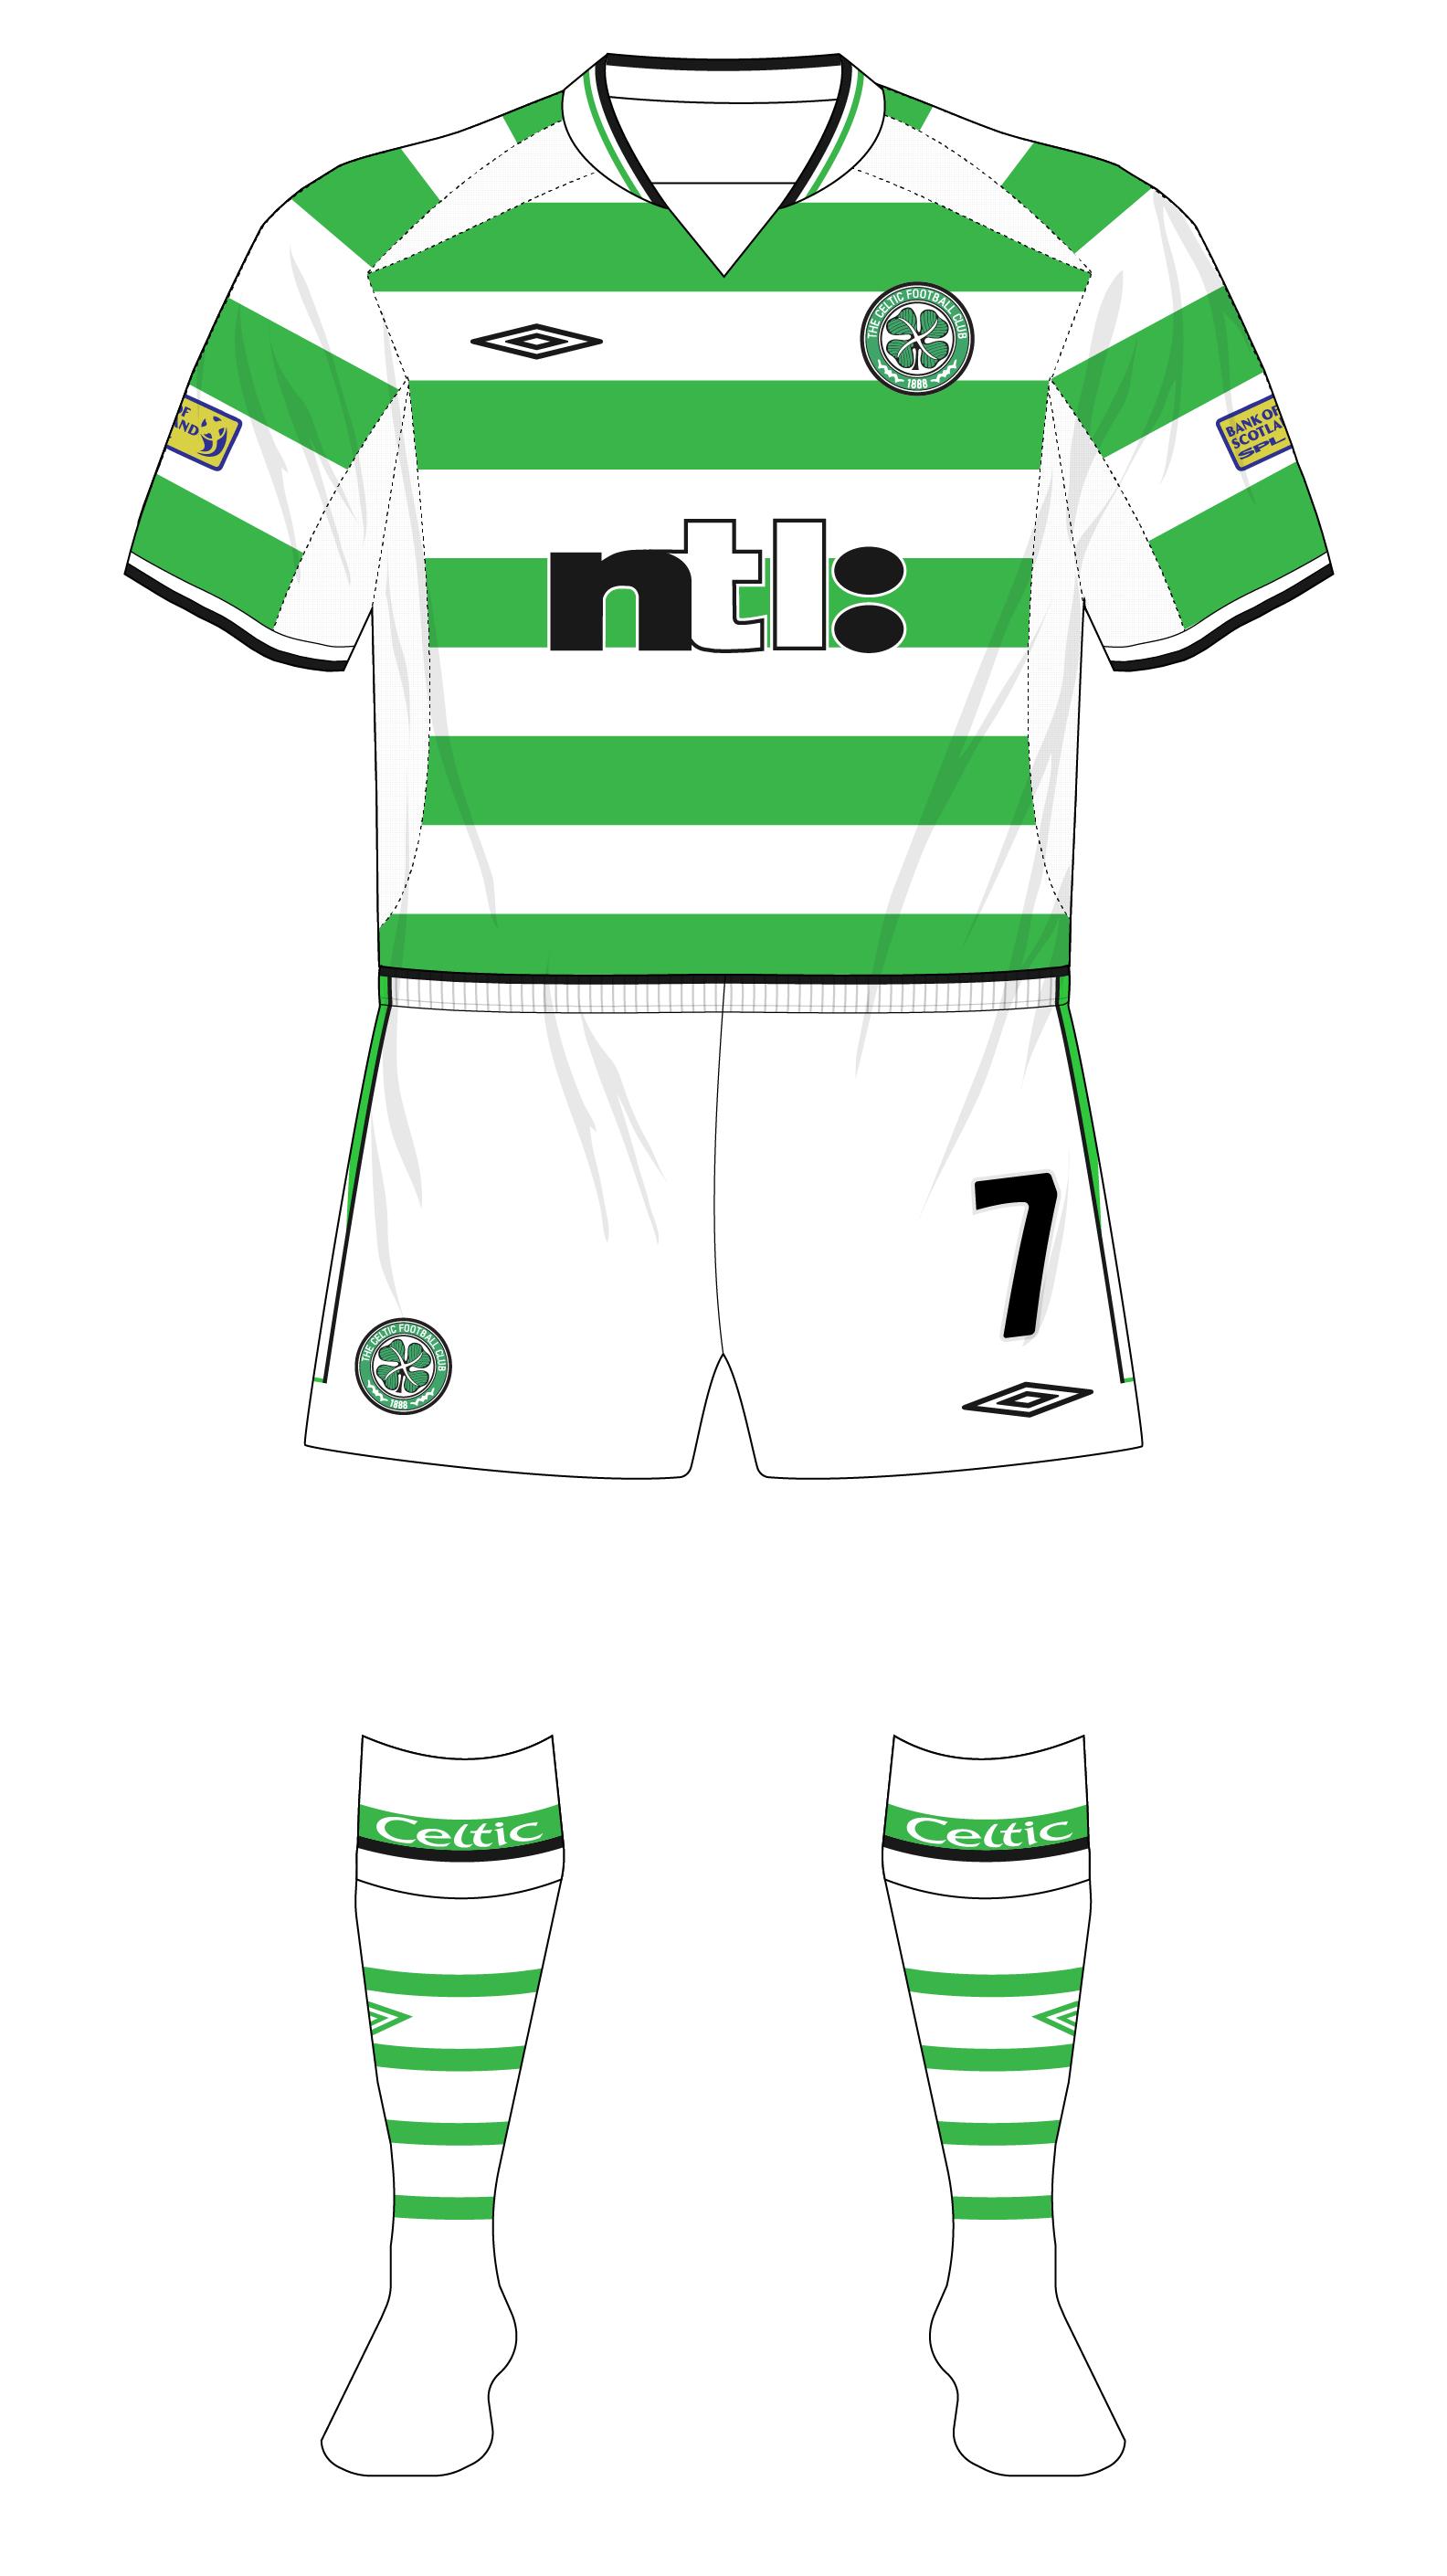 Celtic-2001-2002-Umbro-away-shirt-01-01